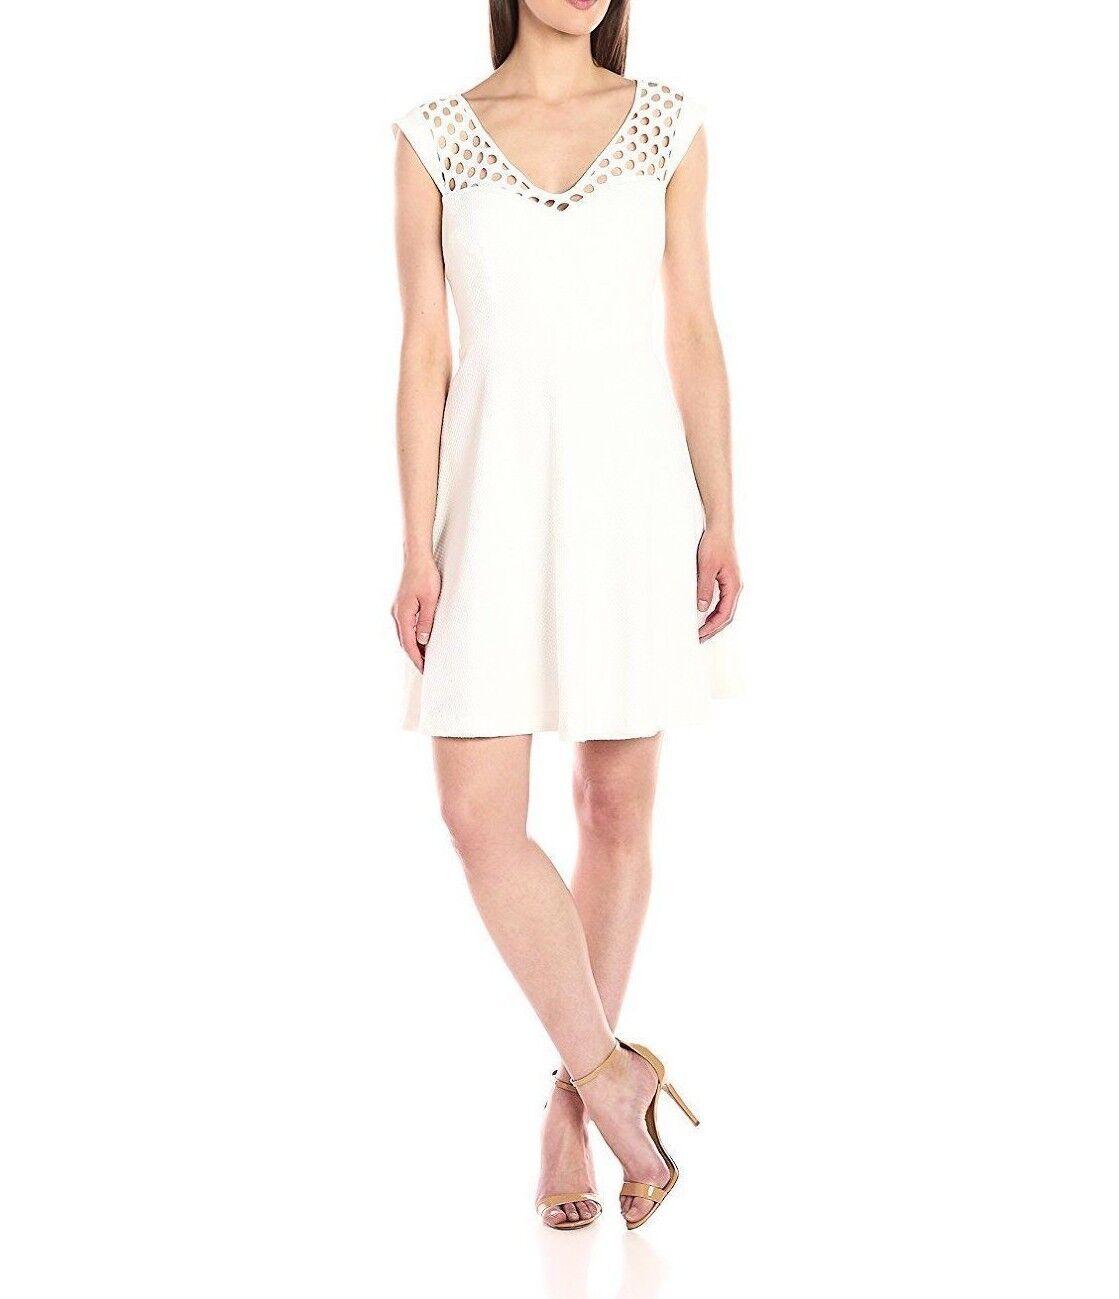 Betsey Johnson Woherren Stretch Jacquard Fit and Flare Ivory Dress - Größe 2    a6